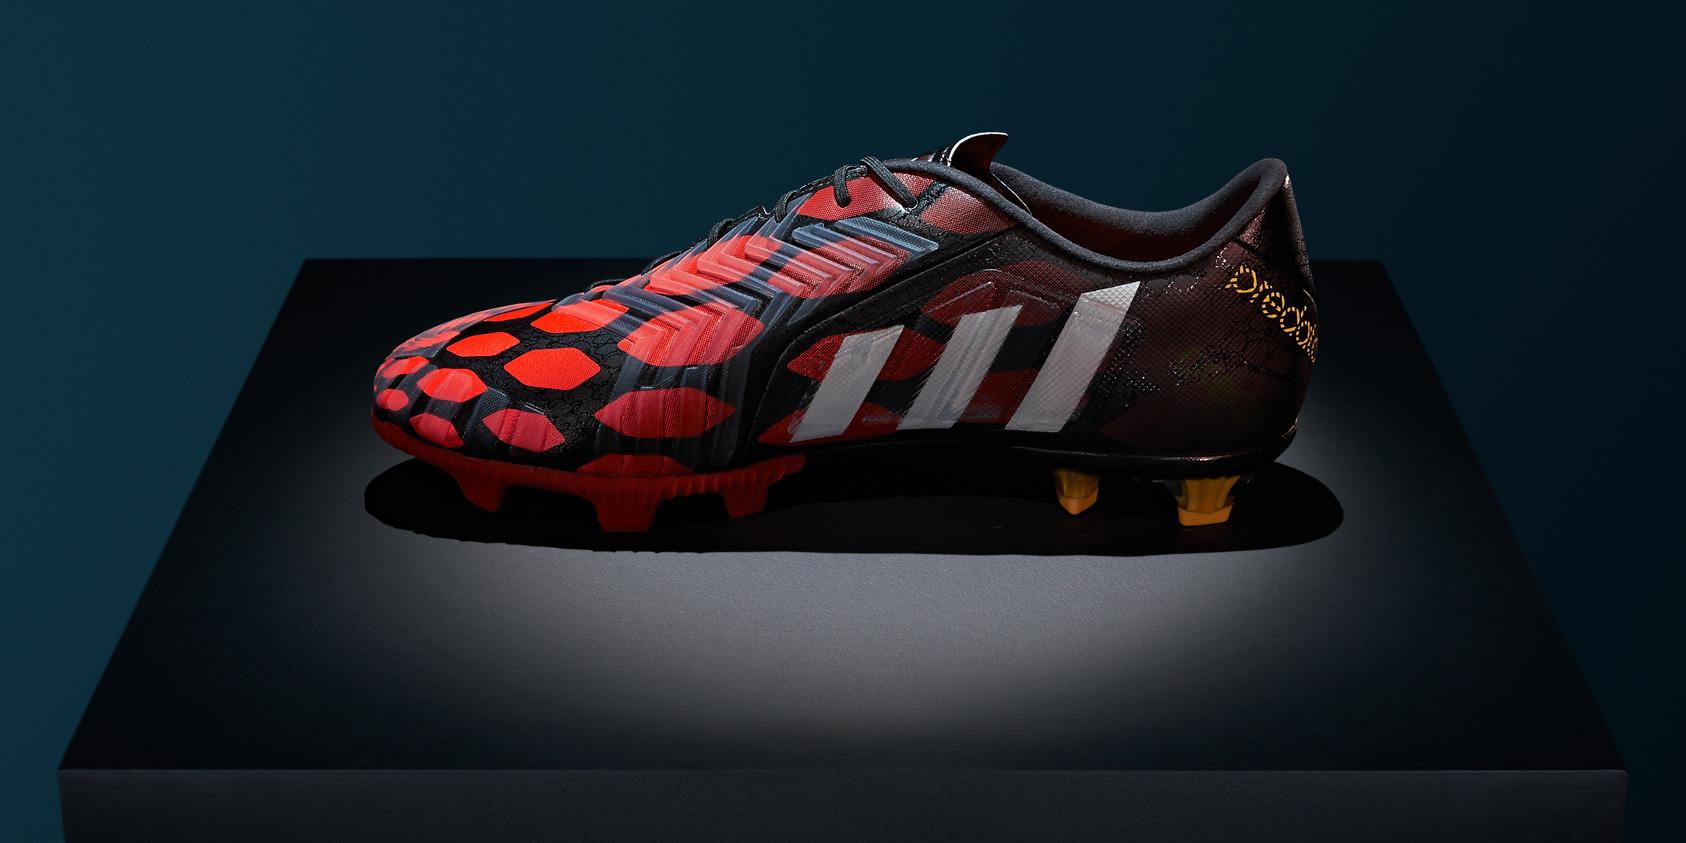 Adidas_Football_Predator_Instinct_Plinth_Social_2x1_06